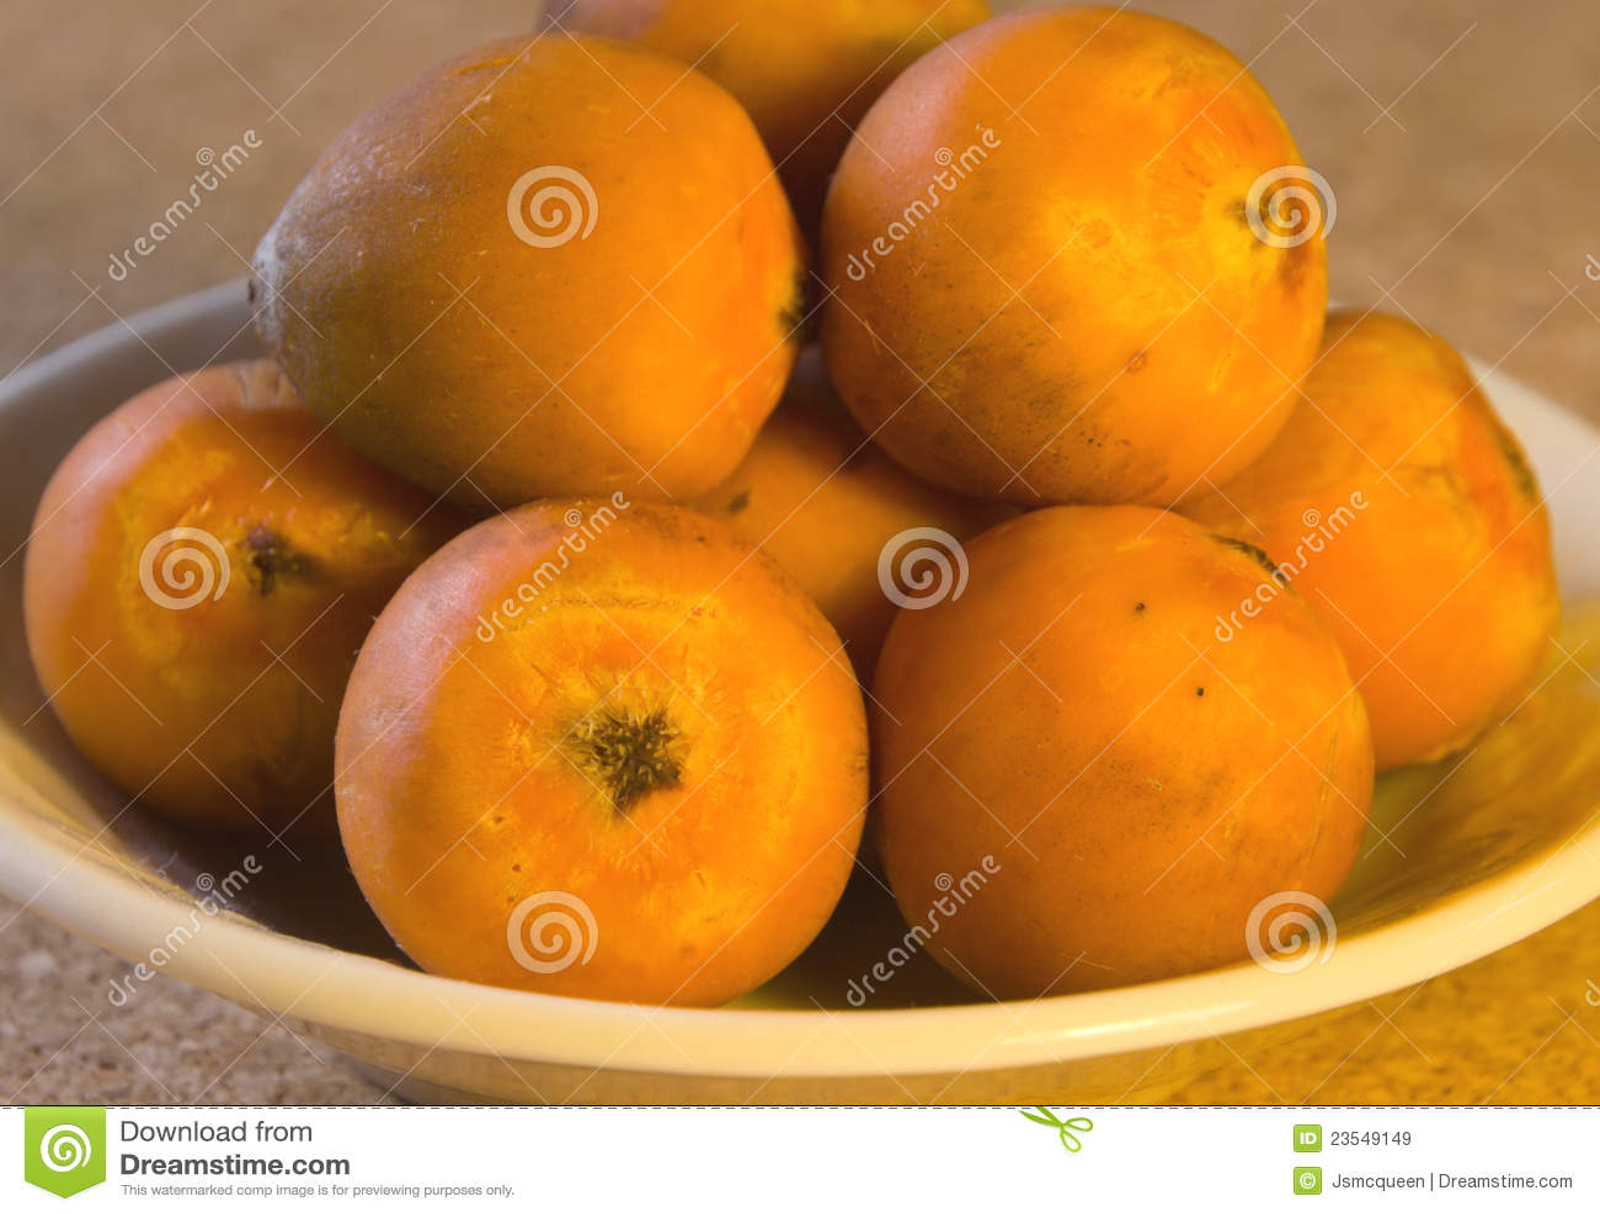 Free Fruit Bowl Clipart